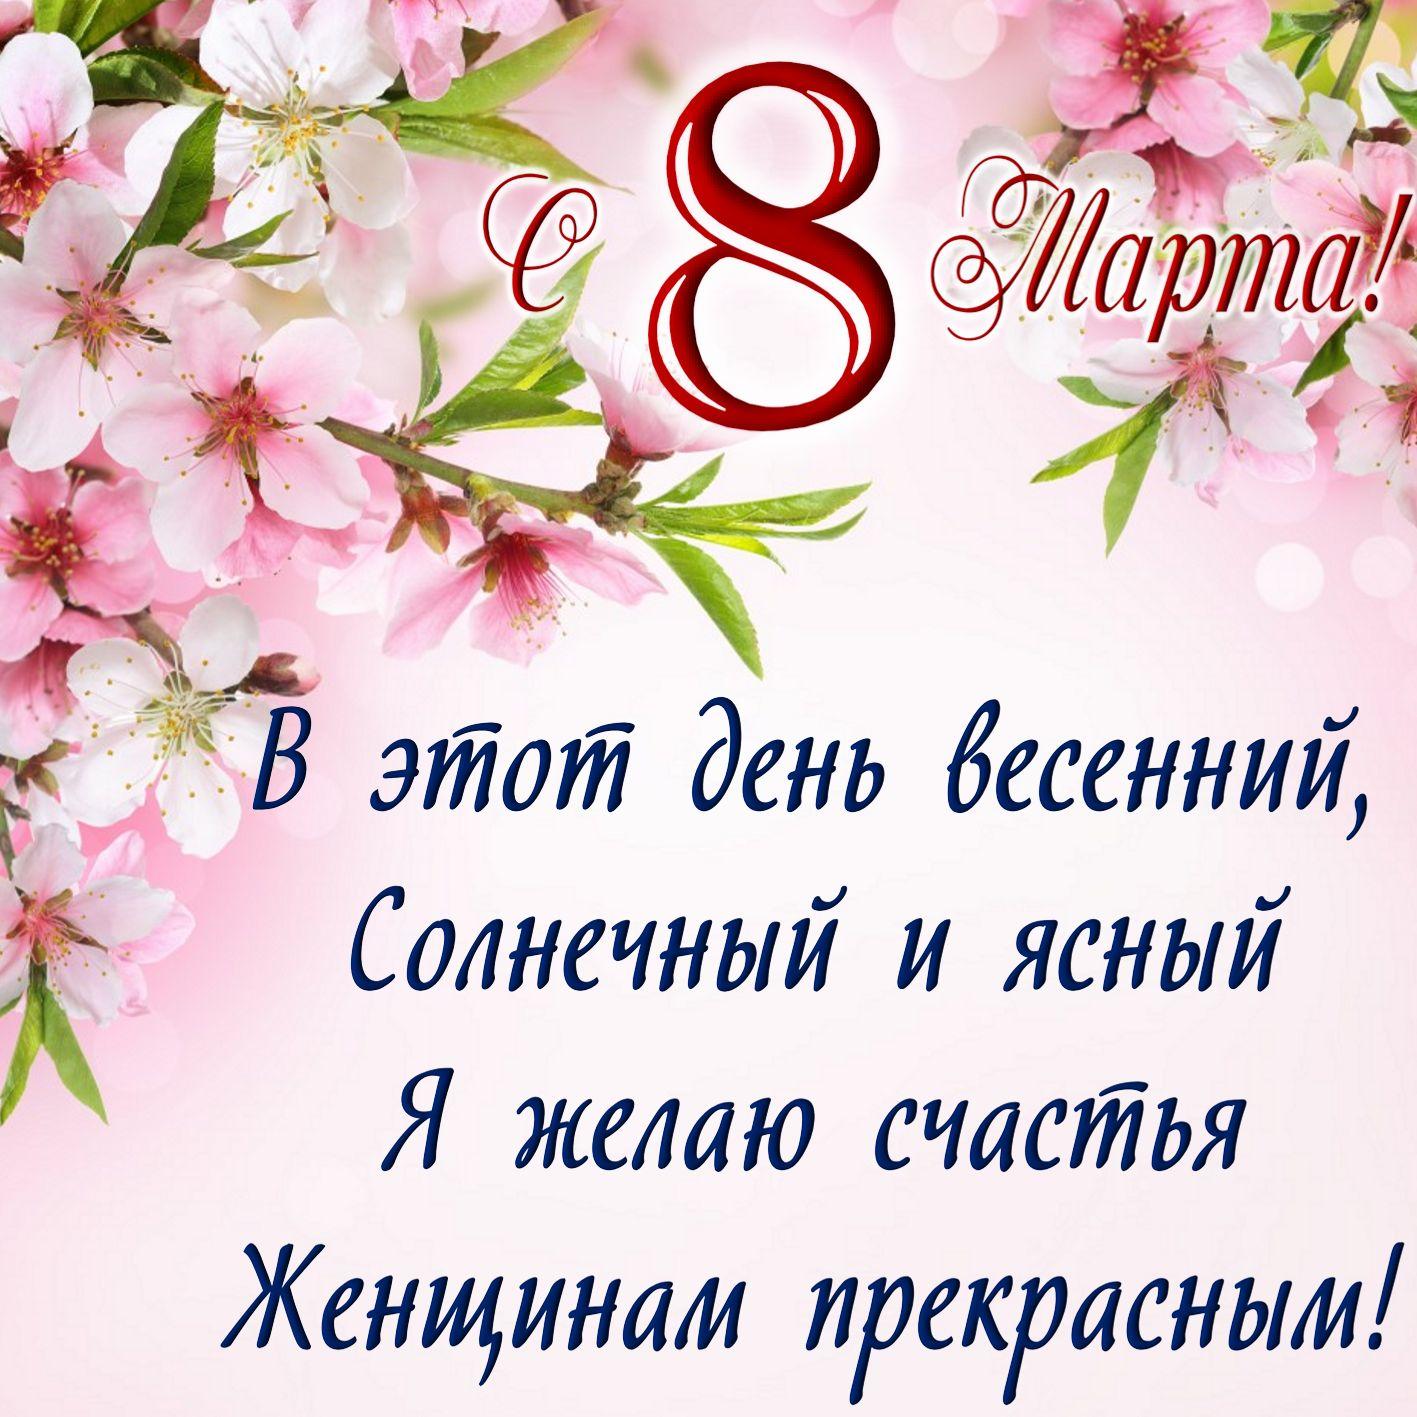 Открытка на 8 марта с весенними цветами